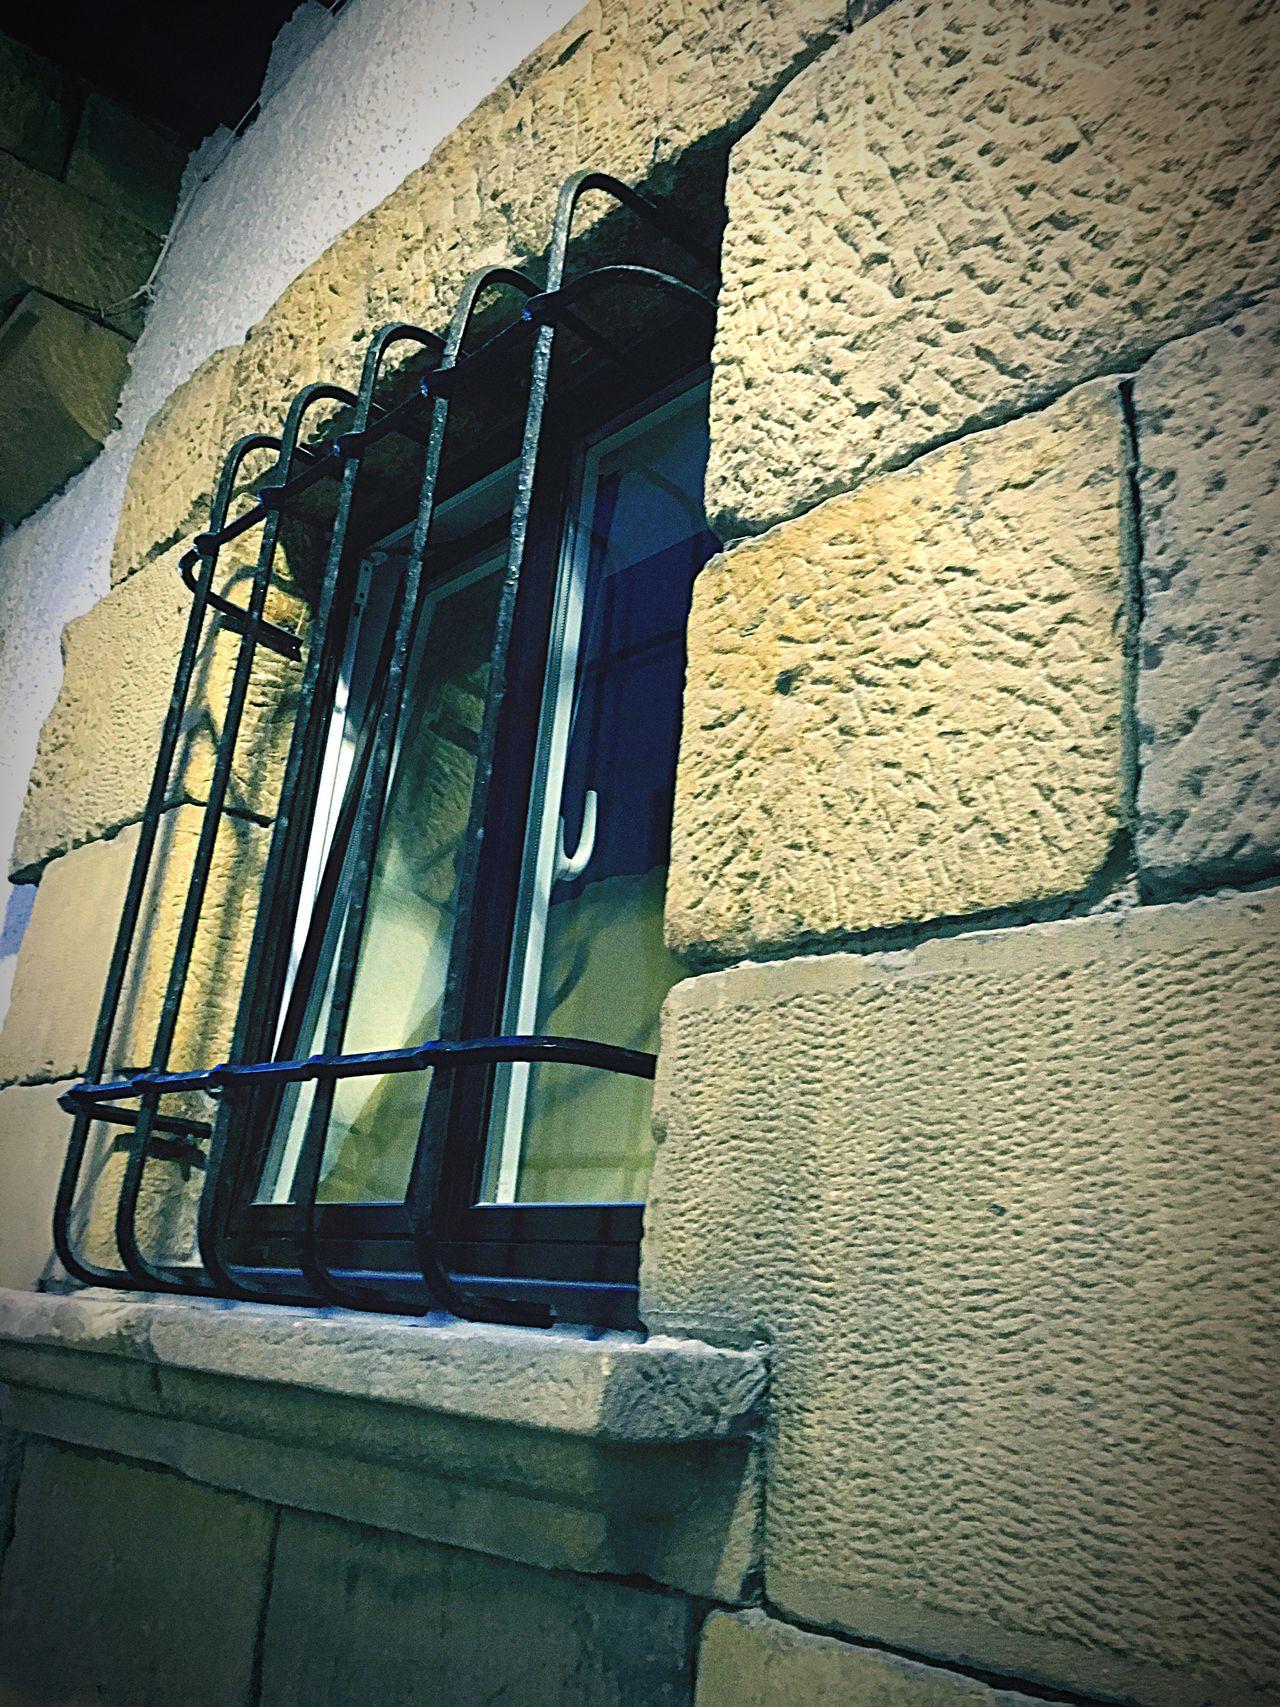 Ventana Window Hello World Taking Photos Landscape Photography Landscape_Collection Landscape_photography Helloworld EyeEm Best Edits Taking Photos EyeEm Best Shots EyeEm Gallery Paisvasco Hondarribia Fachadas Fachada Eyemphotography Euskadibasquecountry Euskaditurismo Landscape_lover